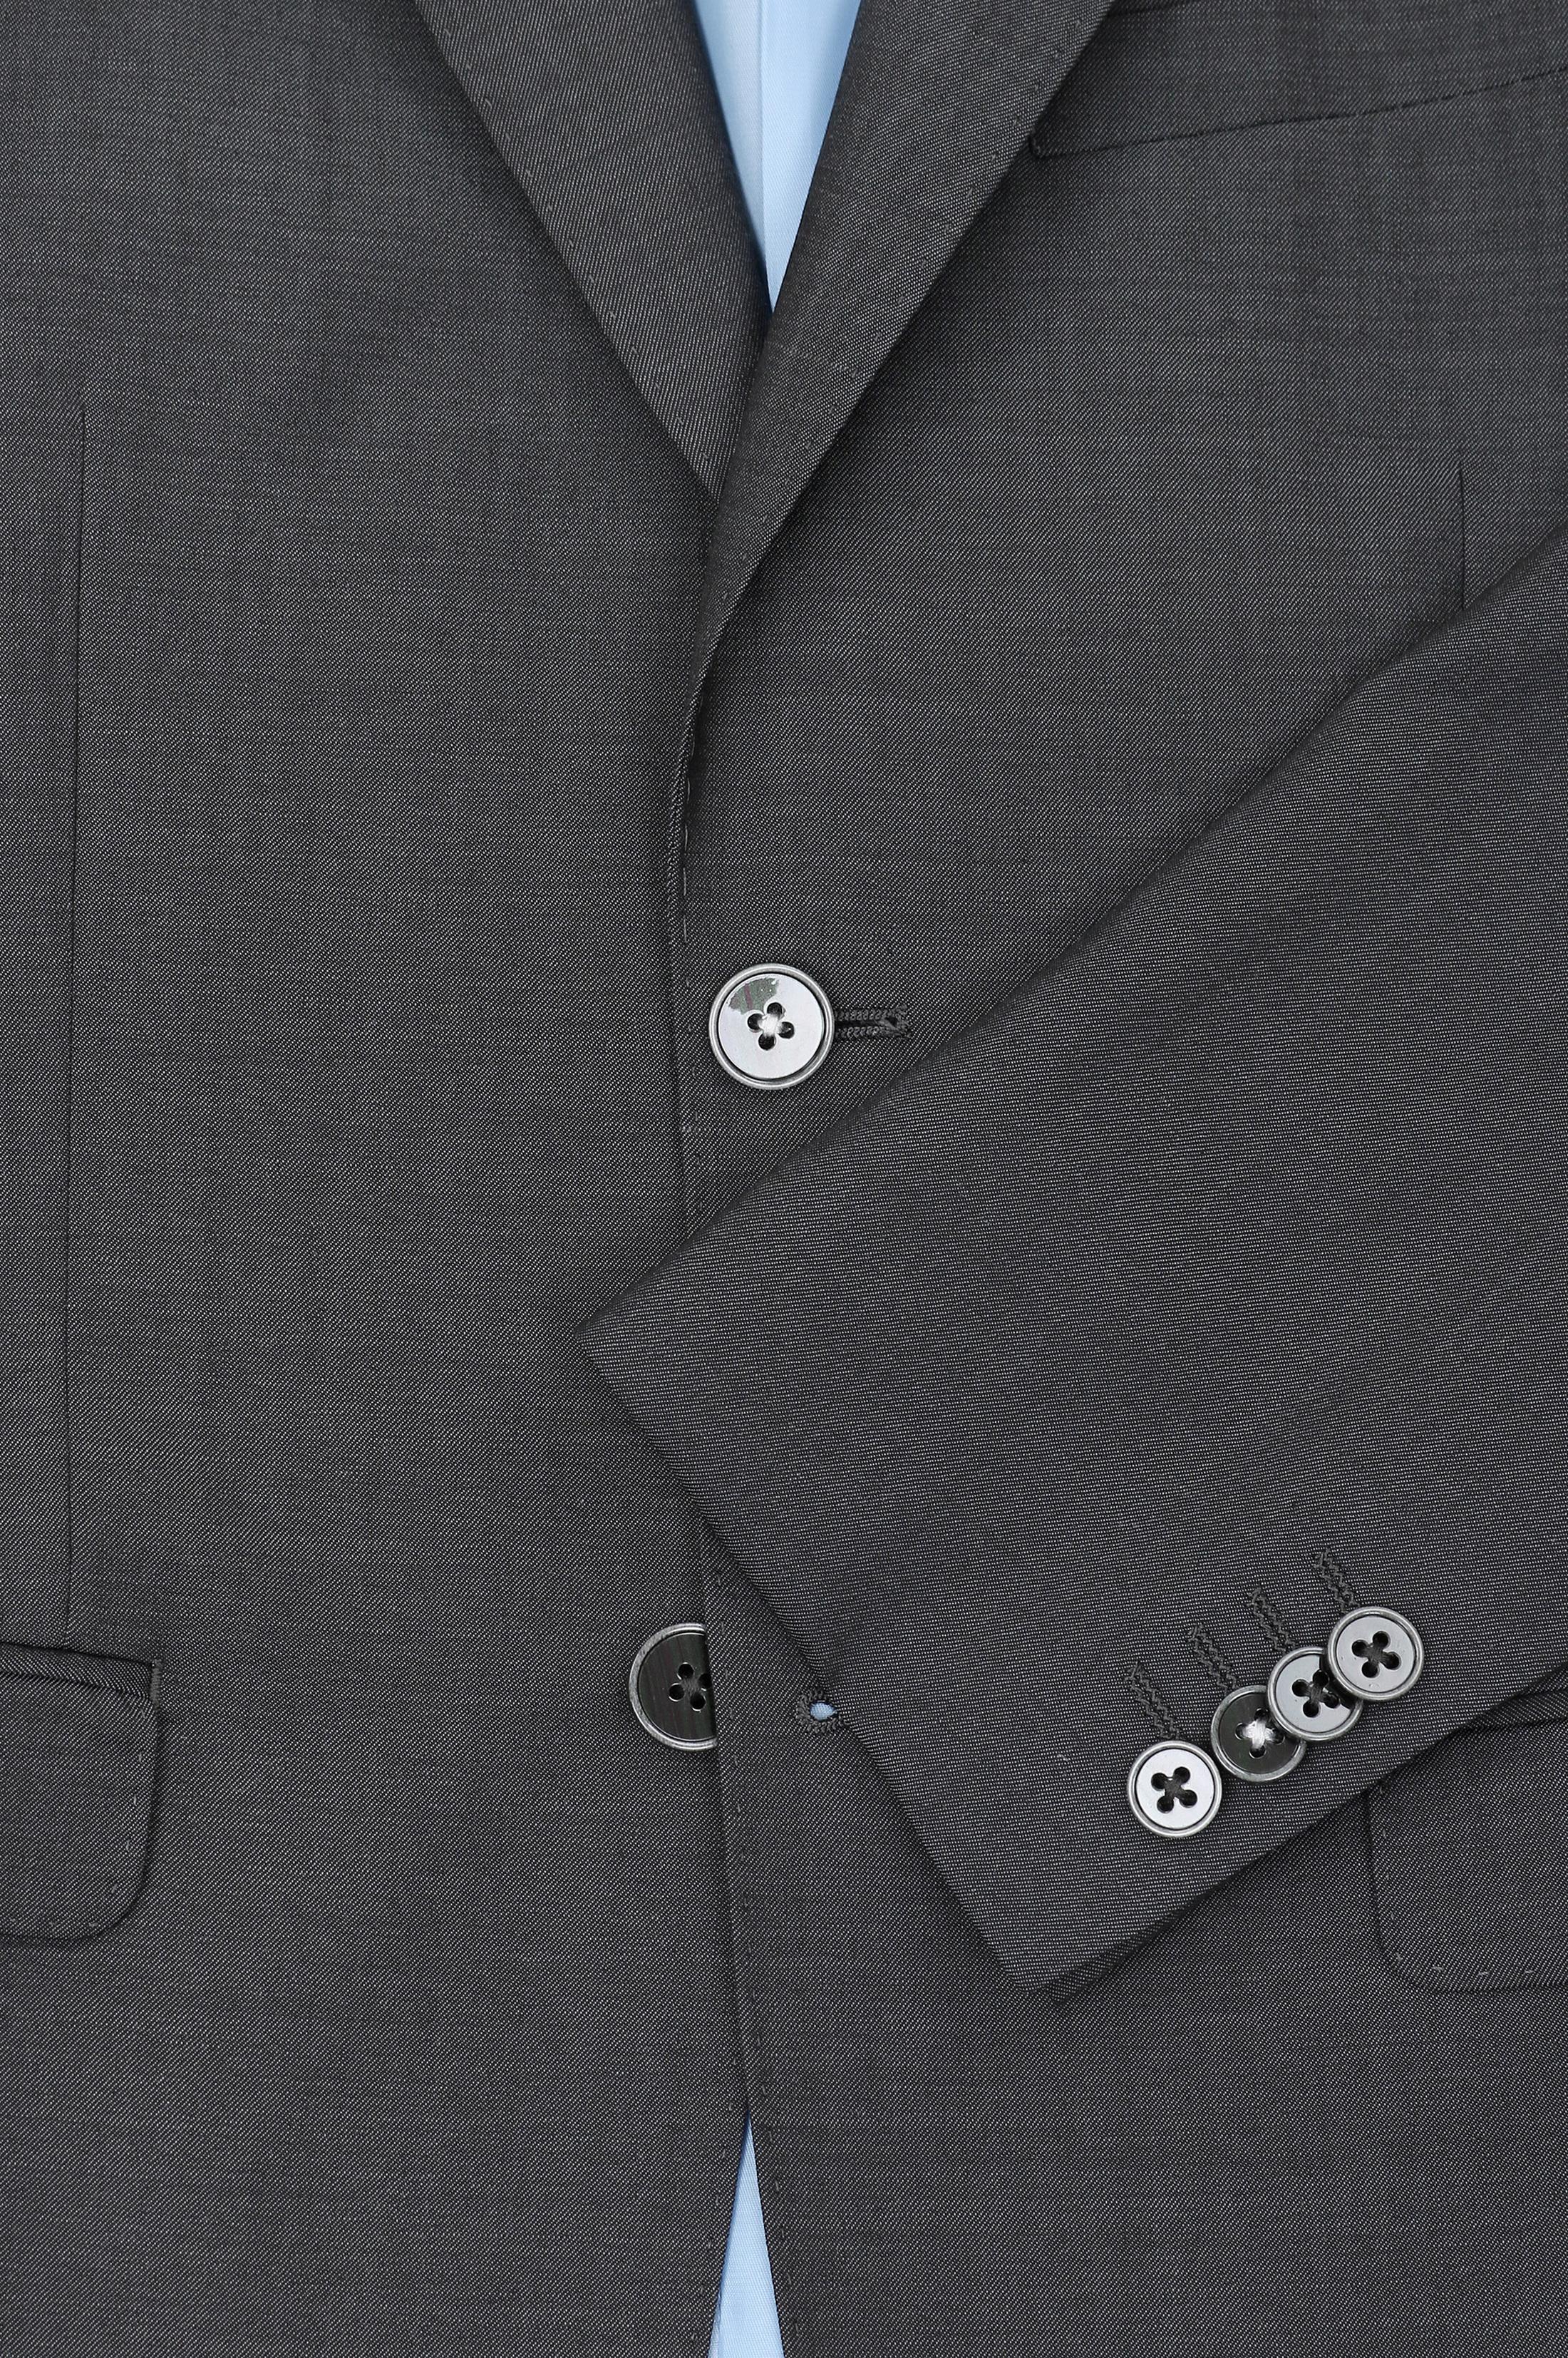 Suitable Anzug Strato Dunkelgrau foto 1